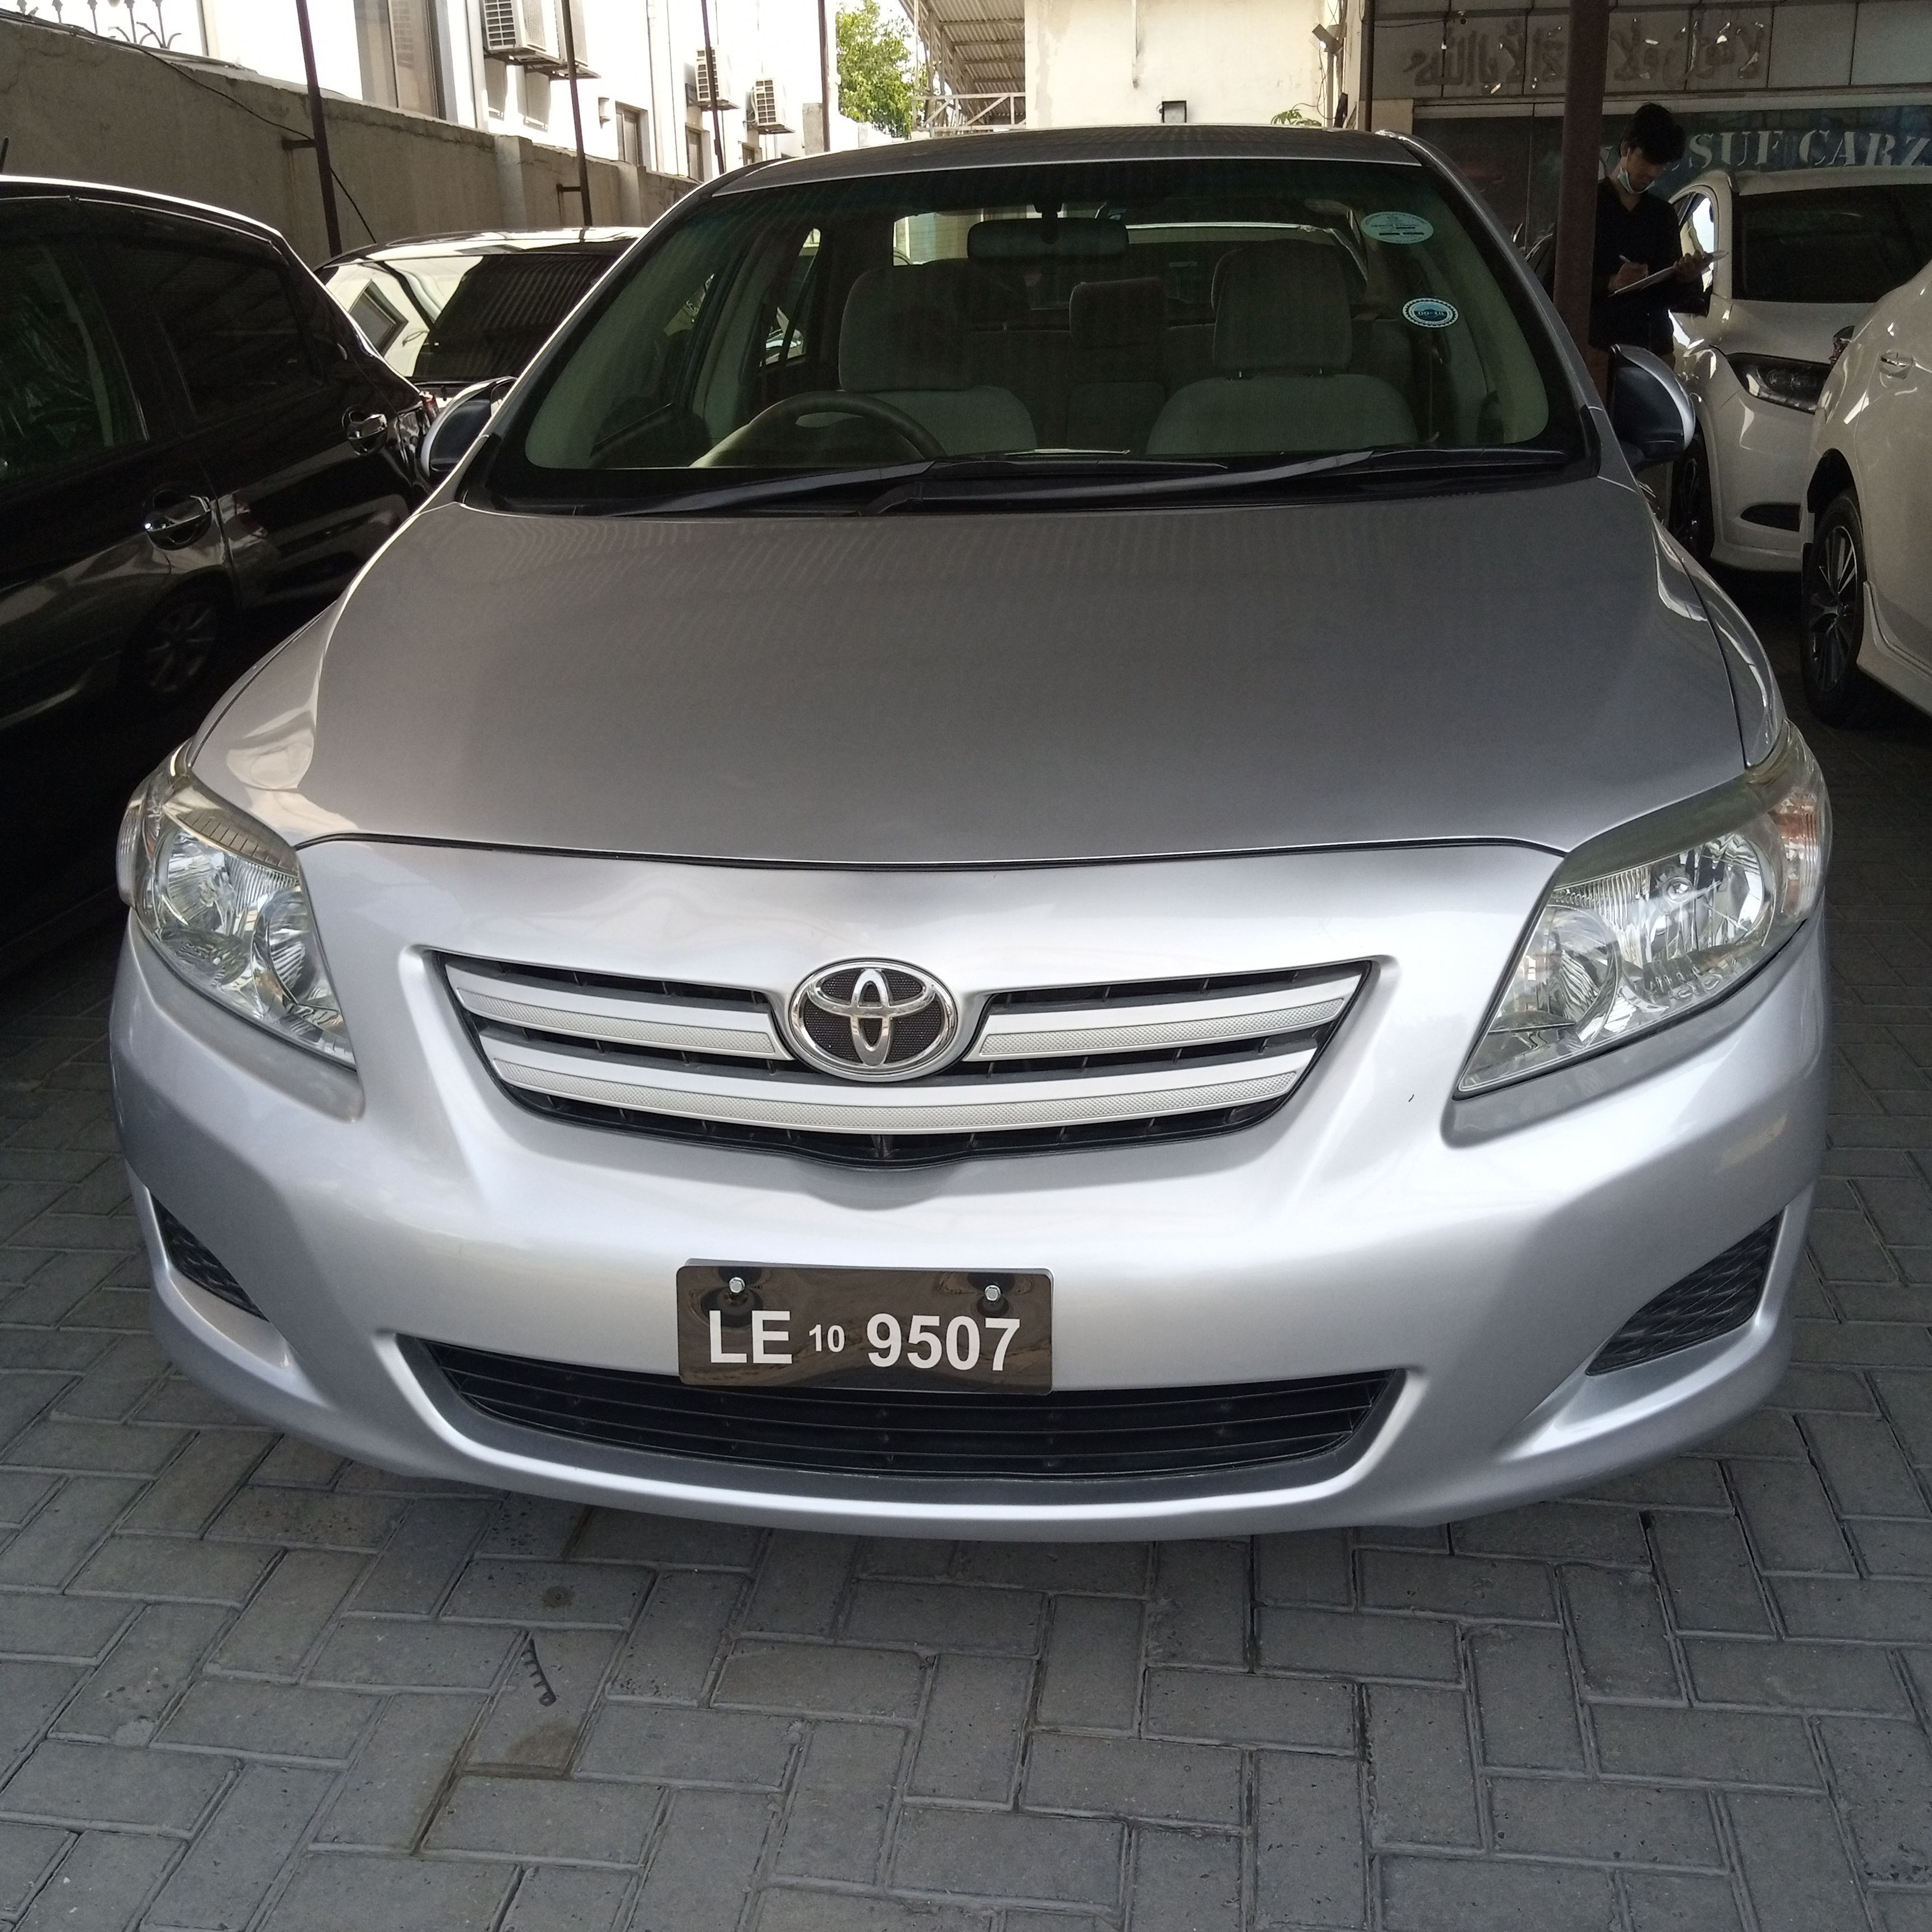 Toyota Corolla Altis SR 1.8 2010